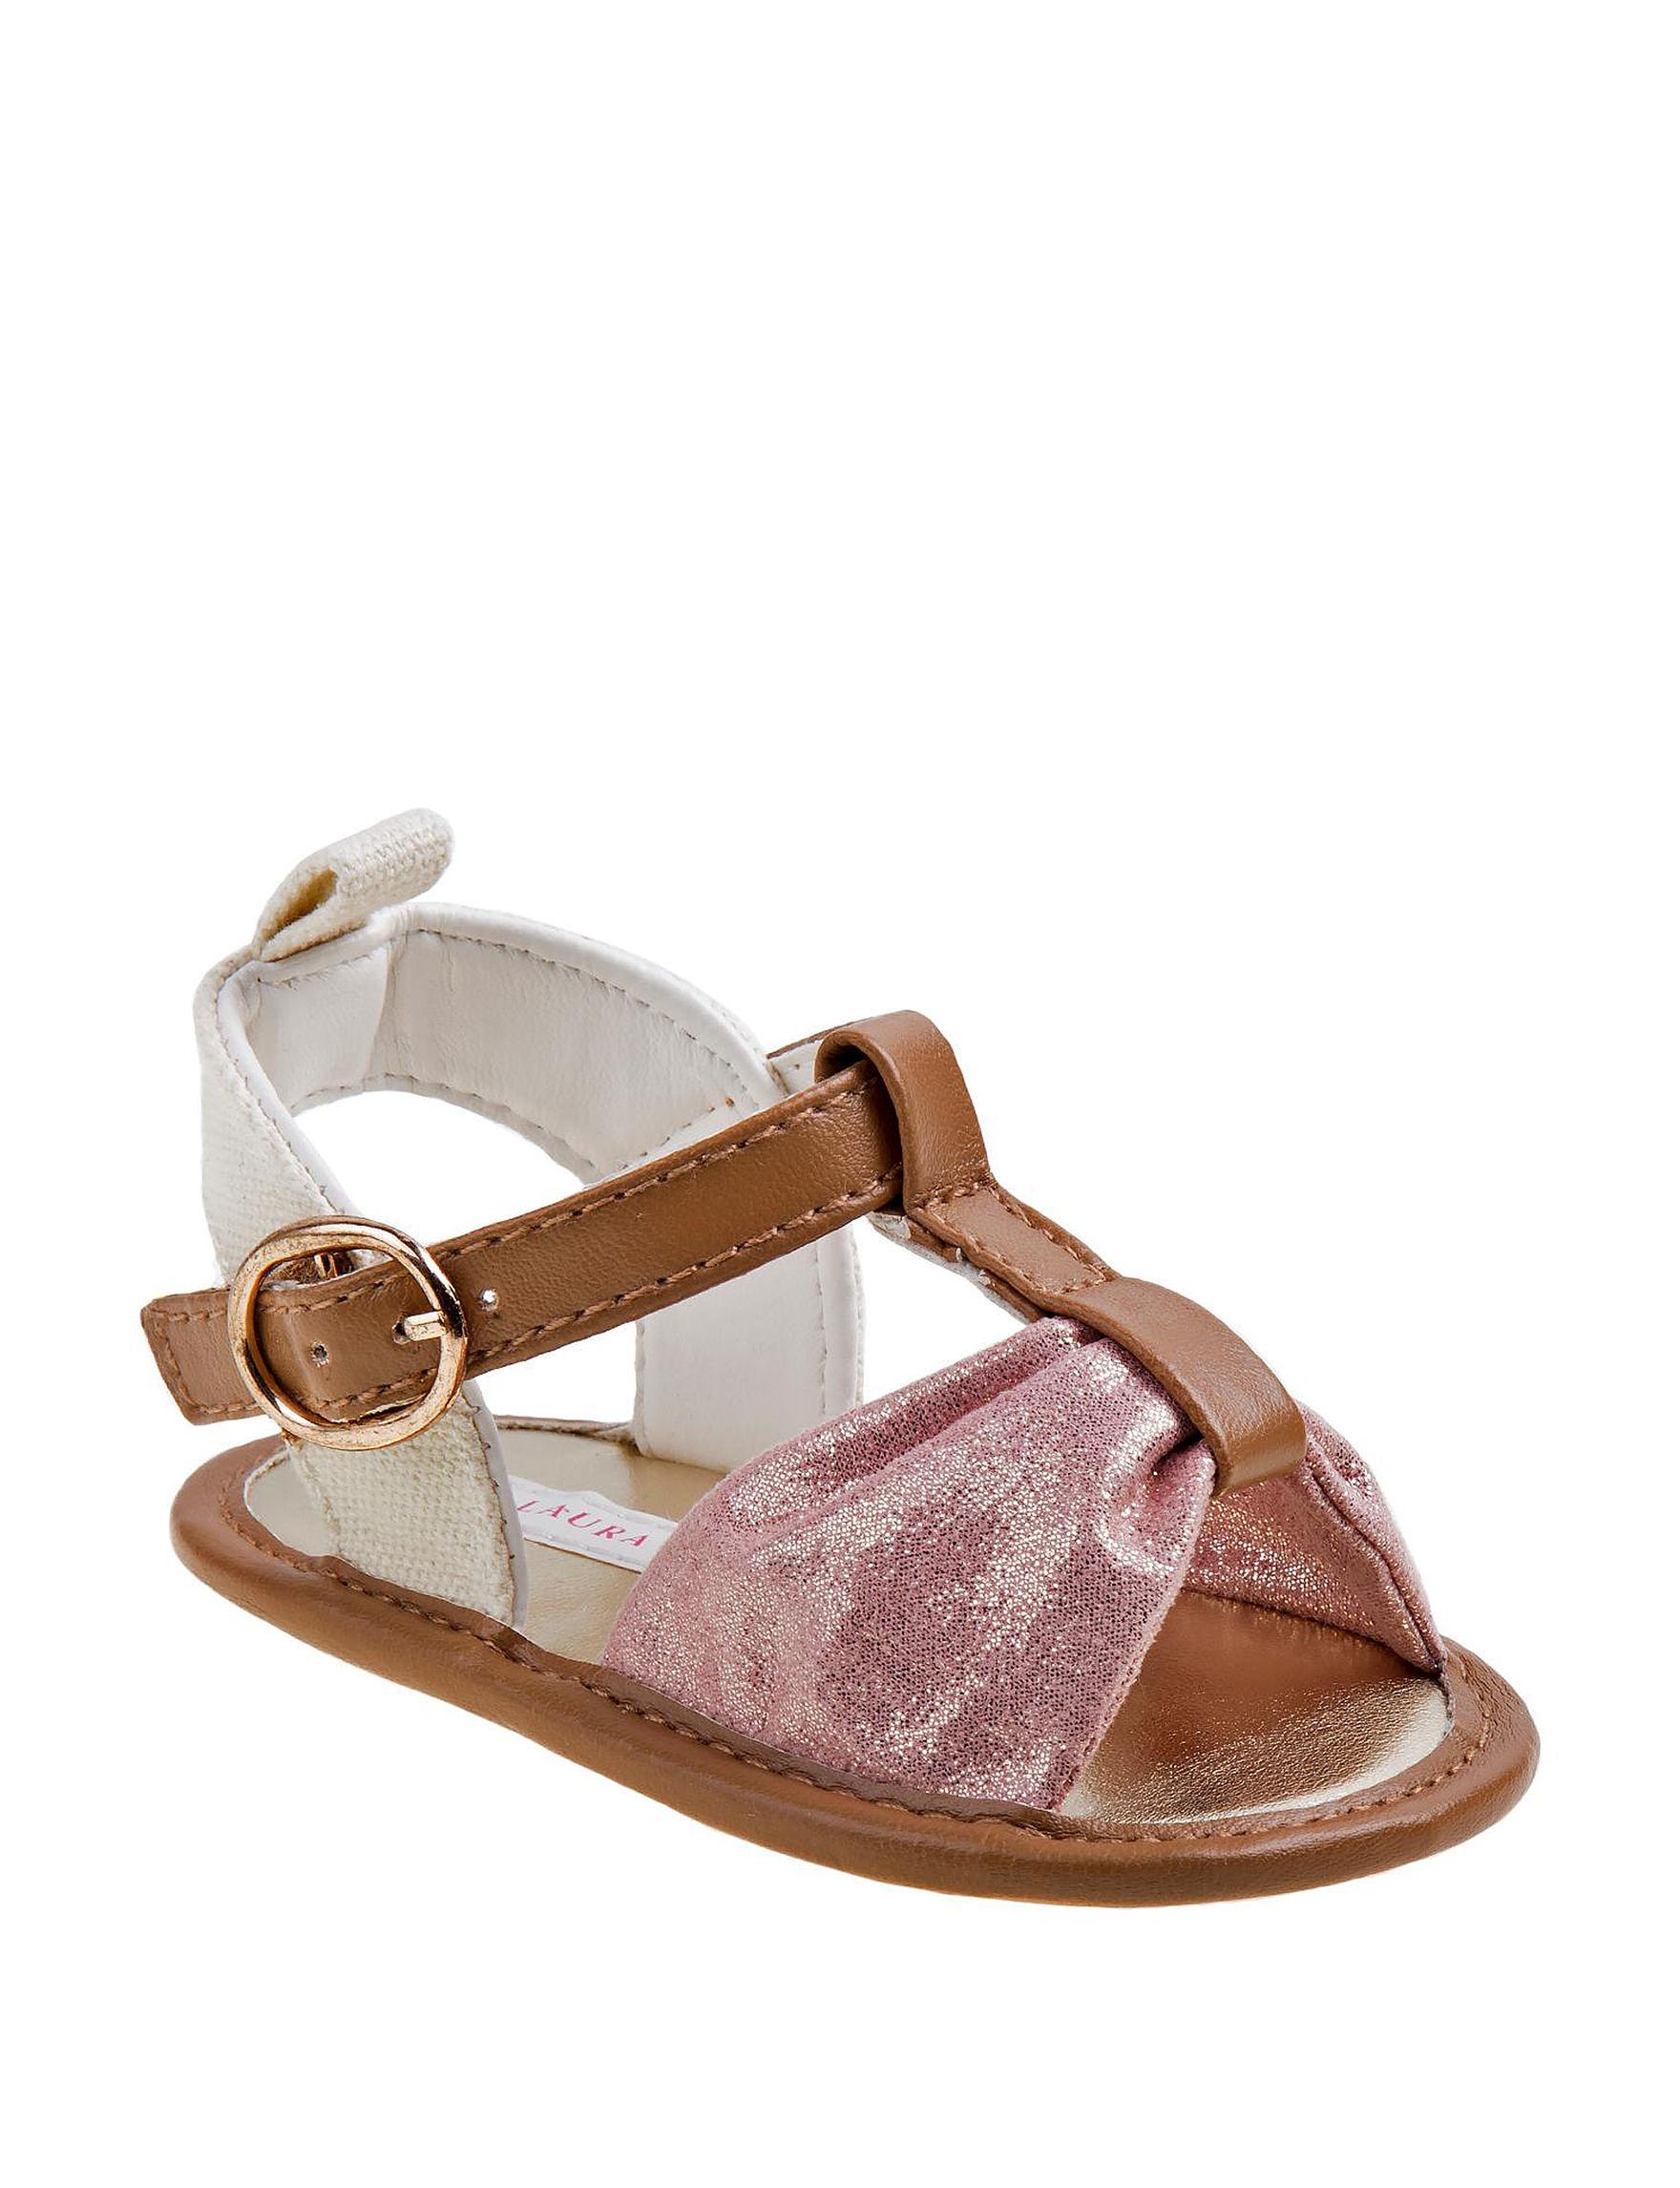 Laura Ashley Pink Flat Sandals